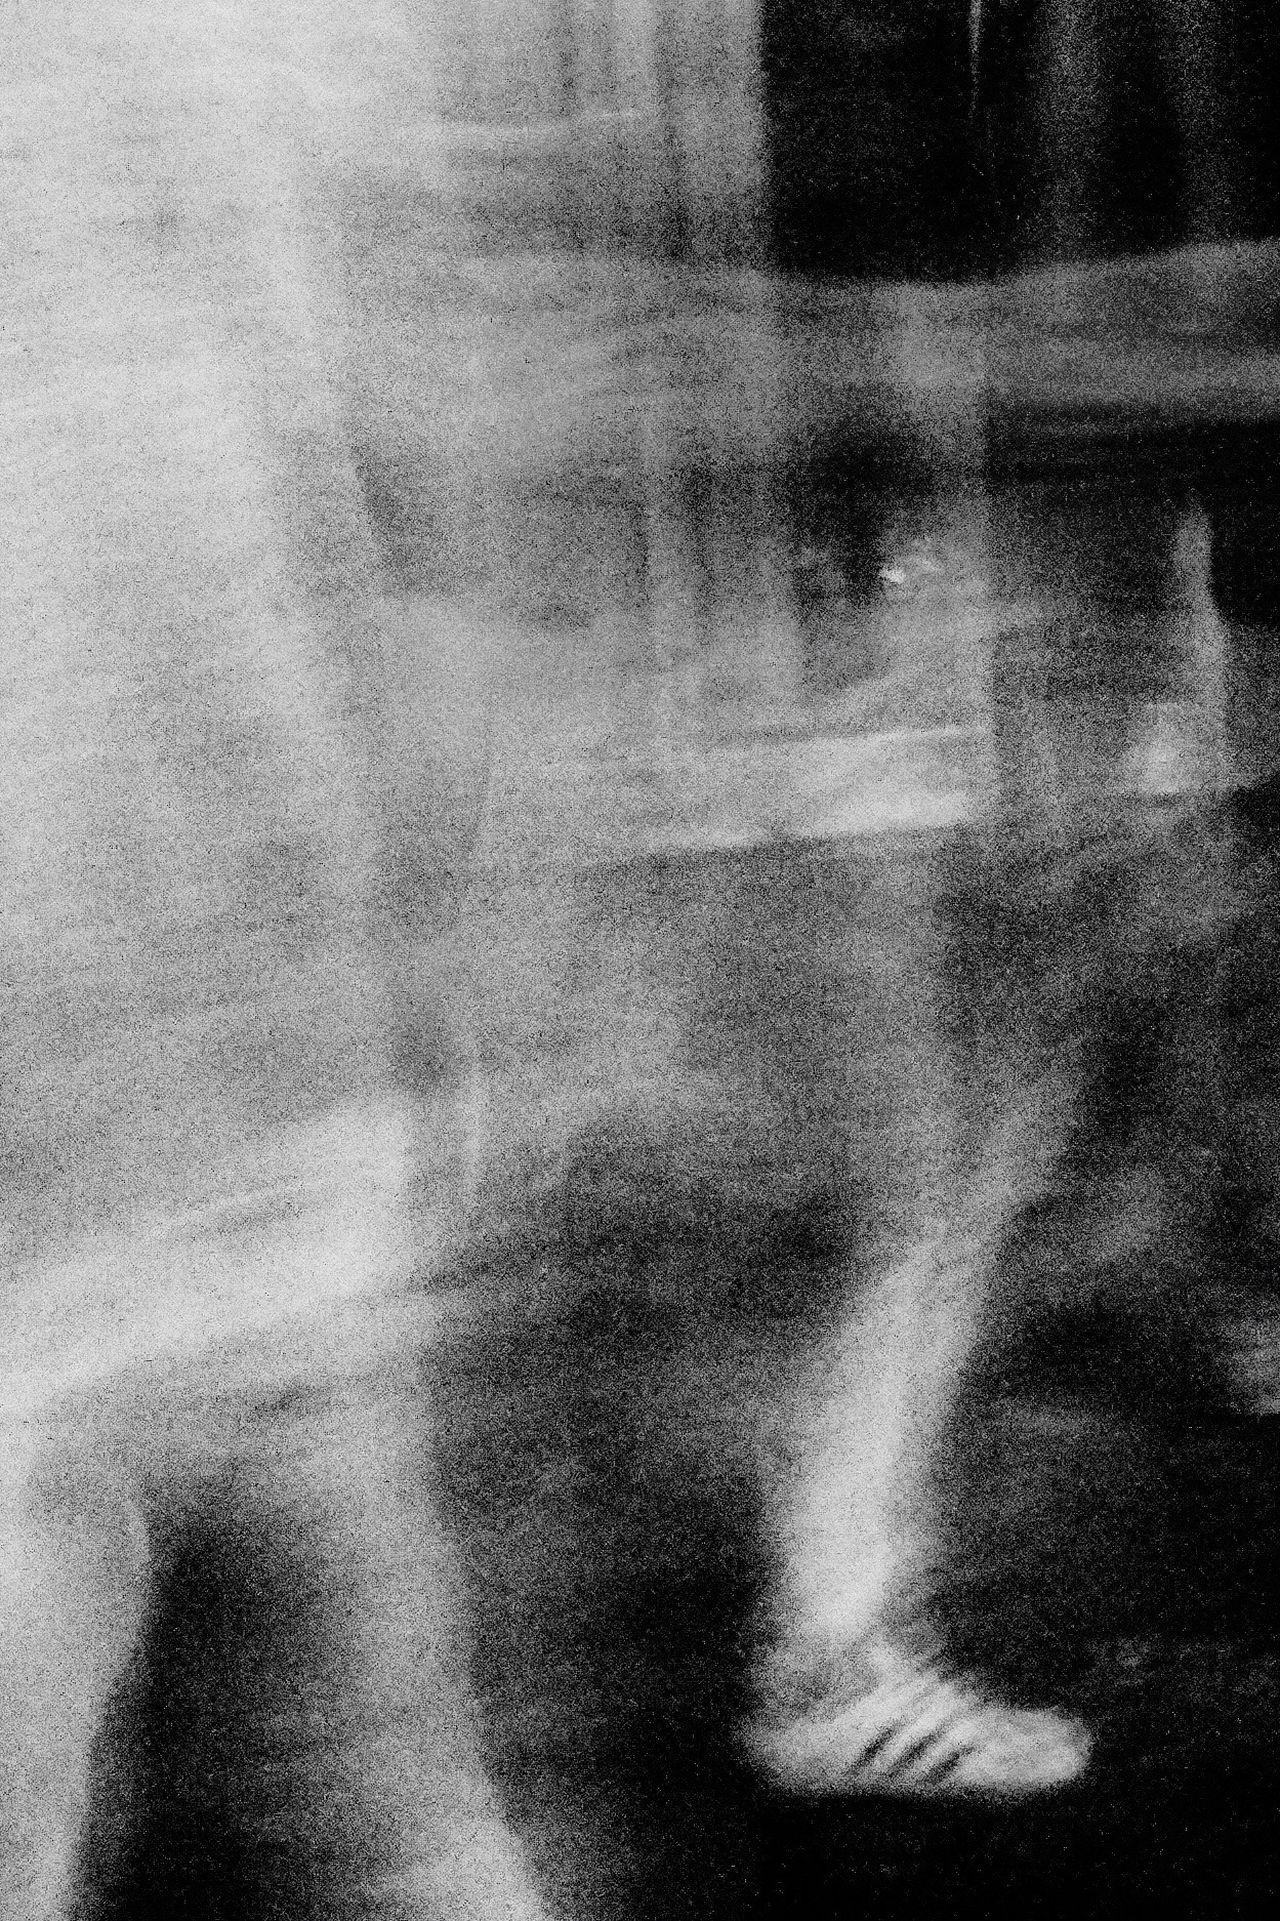 - Feet on the ground - Feet Ground Ground Level View Vanishing Point Ghost Movement Moving Slow Shutter Stripes Stripes Pattern Nightphotography Smoke Blackandwhite Monochrome Monochrome Photography Nikon Nikonphotography